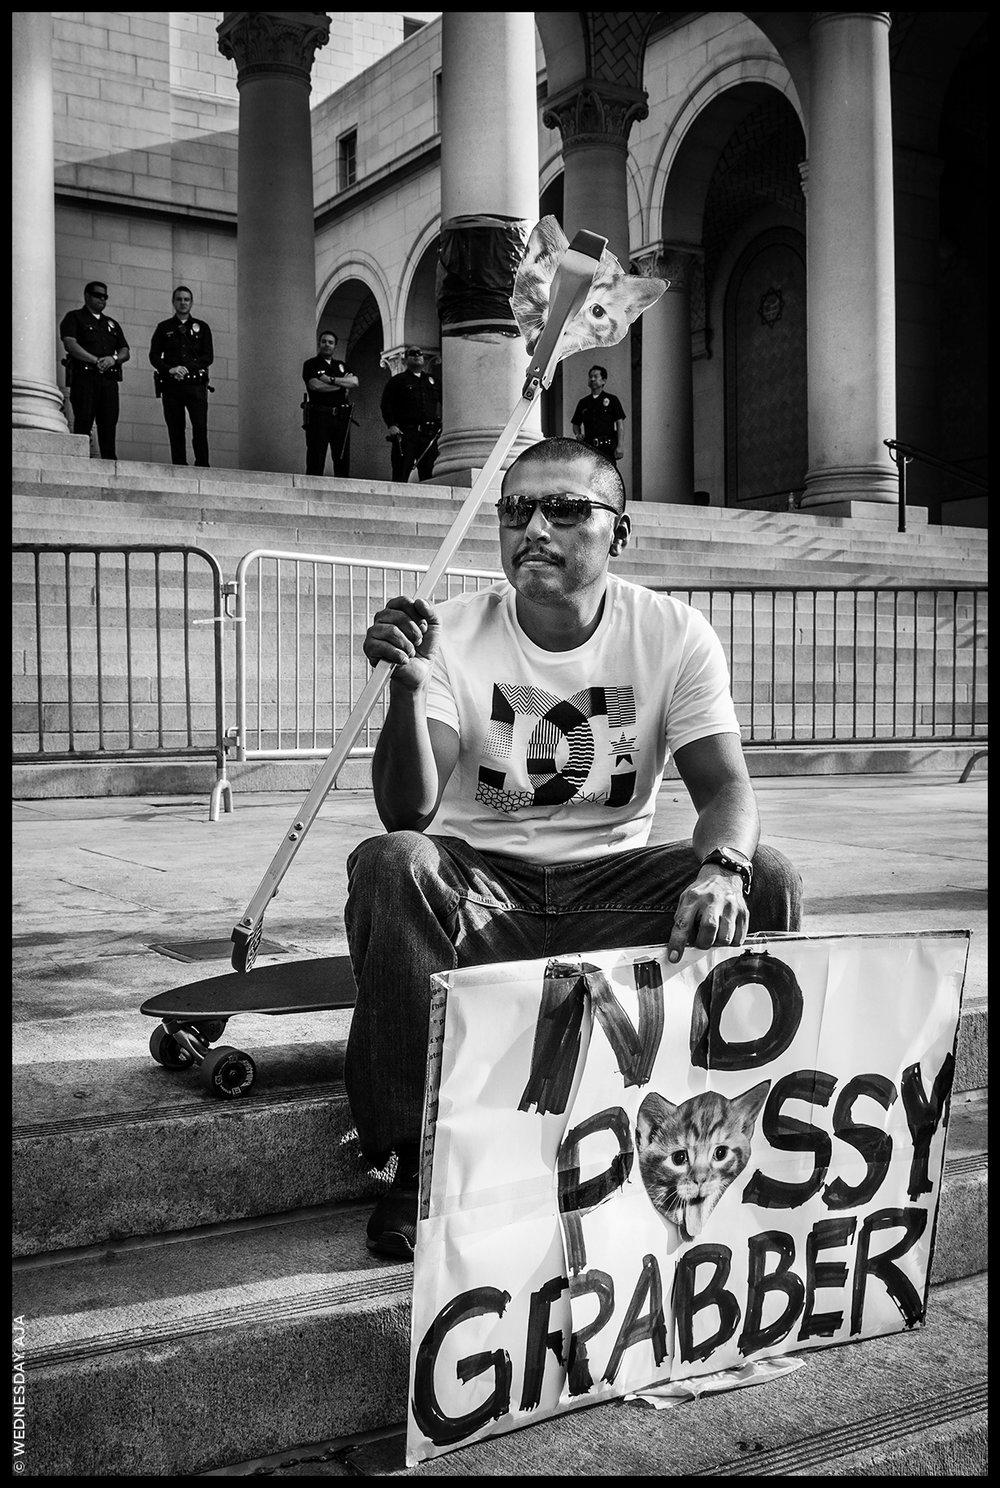 United Against Trump & Hate  Los Angeles, California Nov 12, 2016